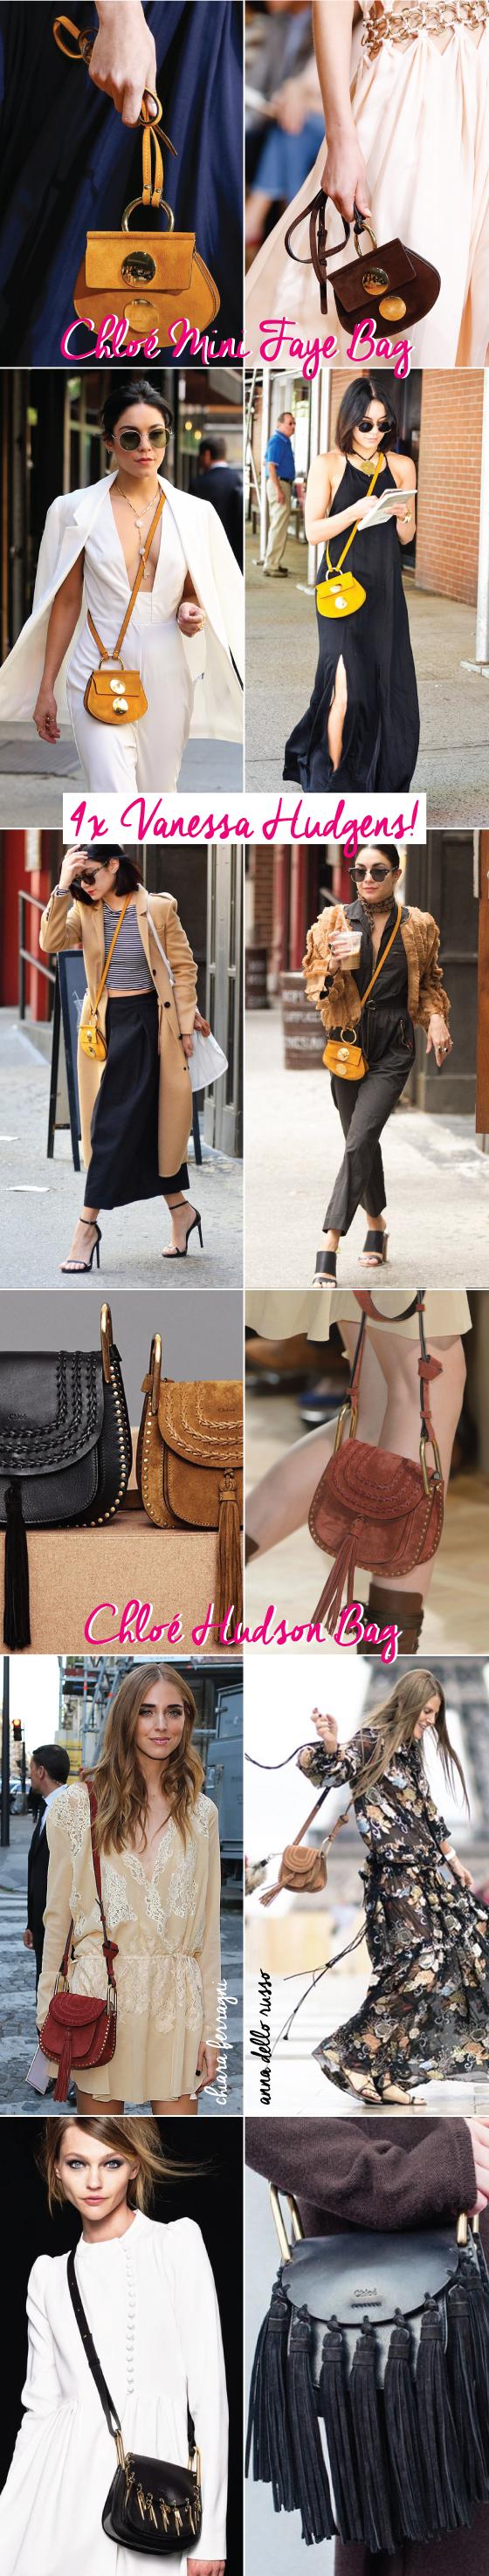 chloe-bolsa-bag-desejo-it-quem-usa-quanto-custa-tendencia-trend-hudson-drew-faye-vanessa-hudgens-olivia-palermo-celebridade-